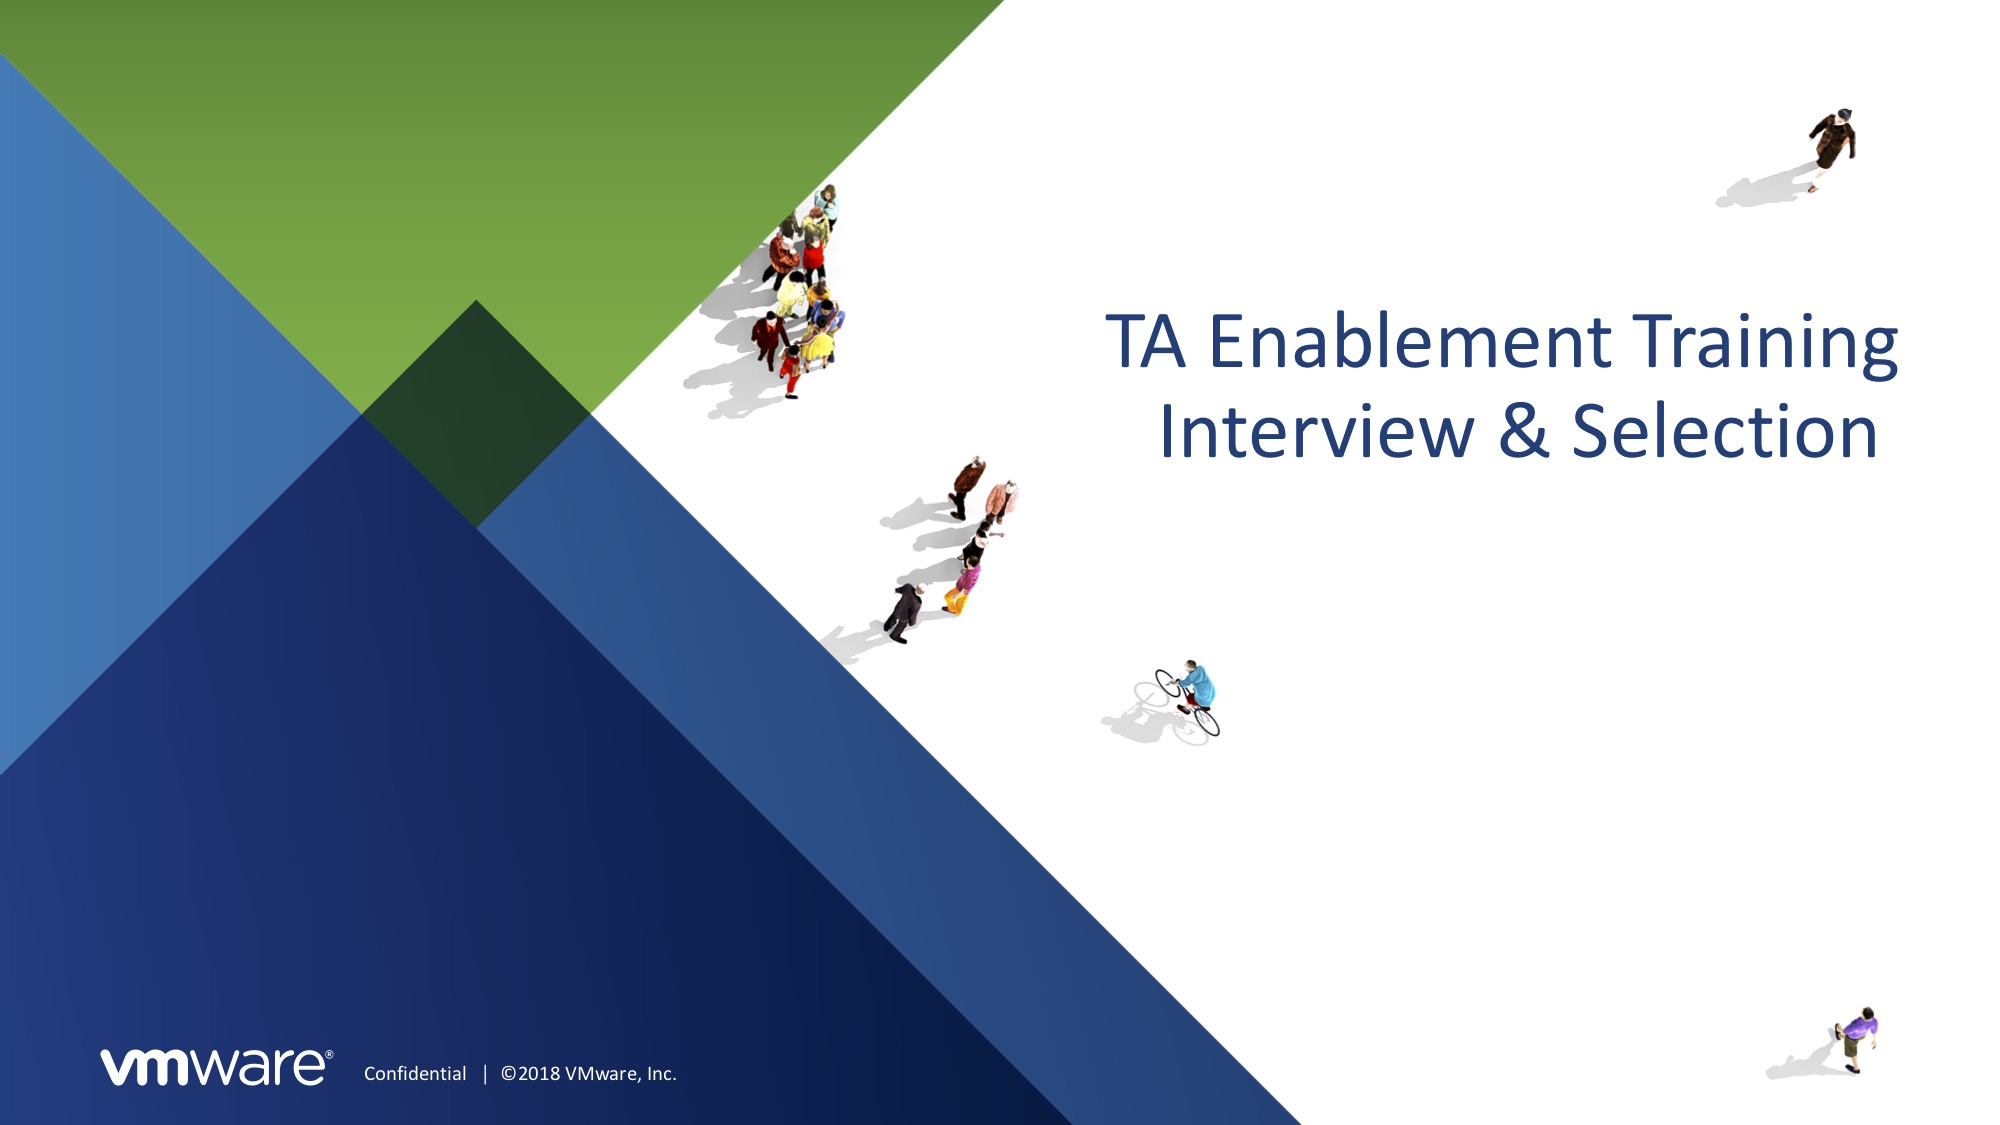 VMware_TalentAcquisition_1